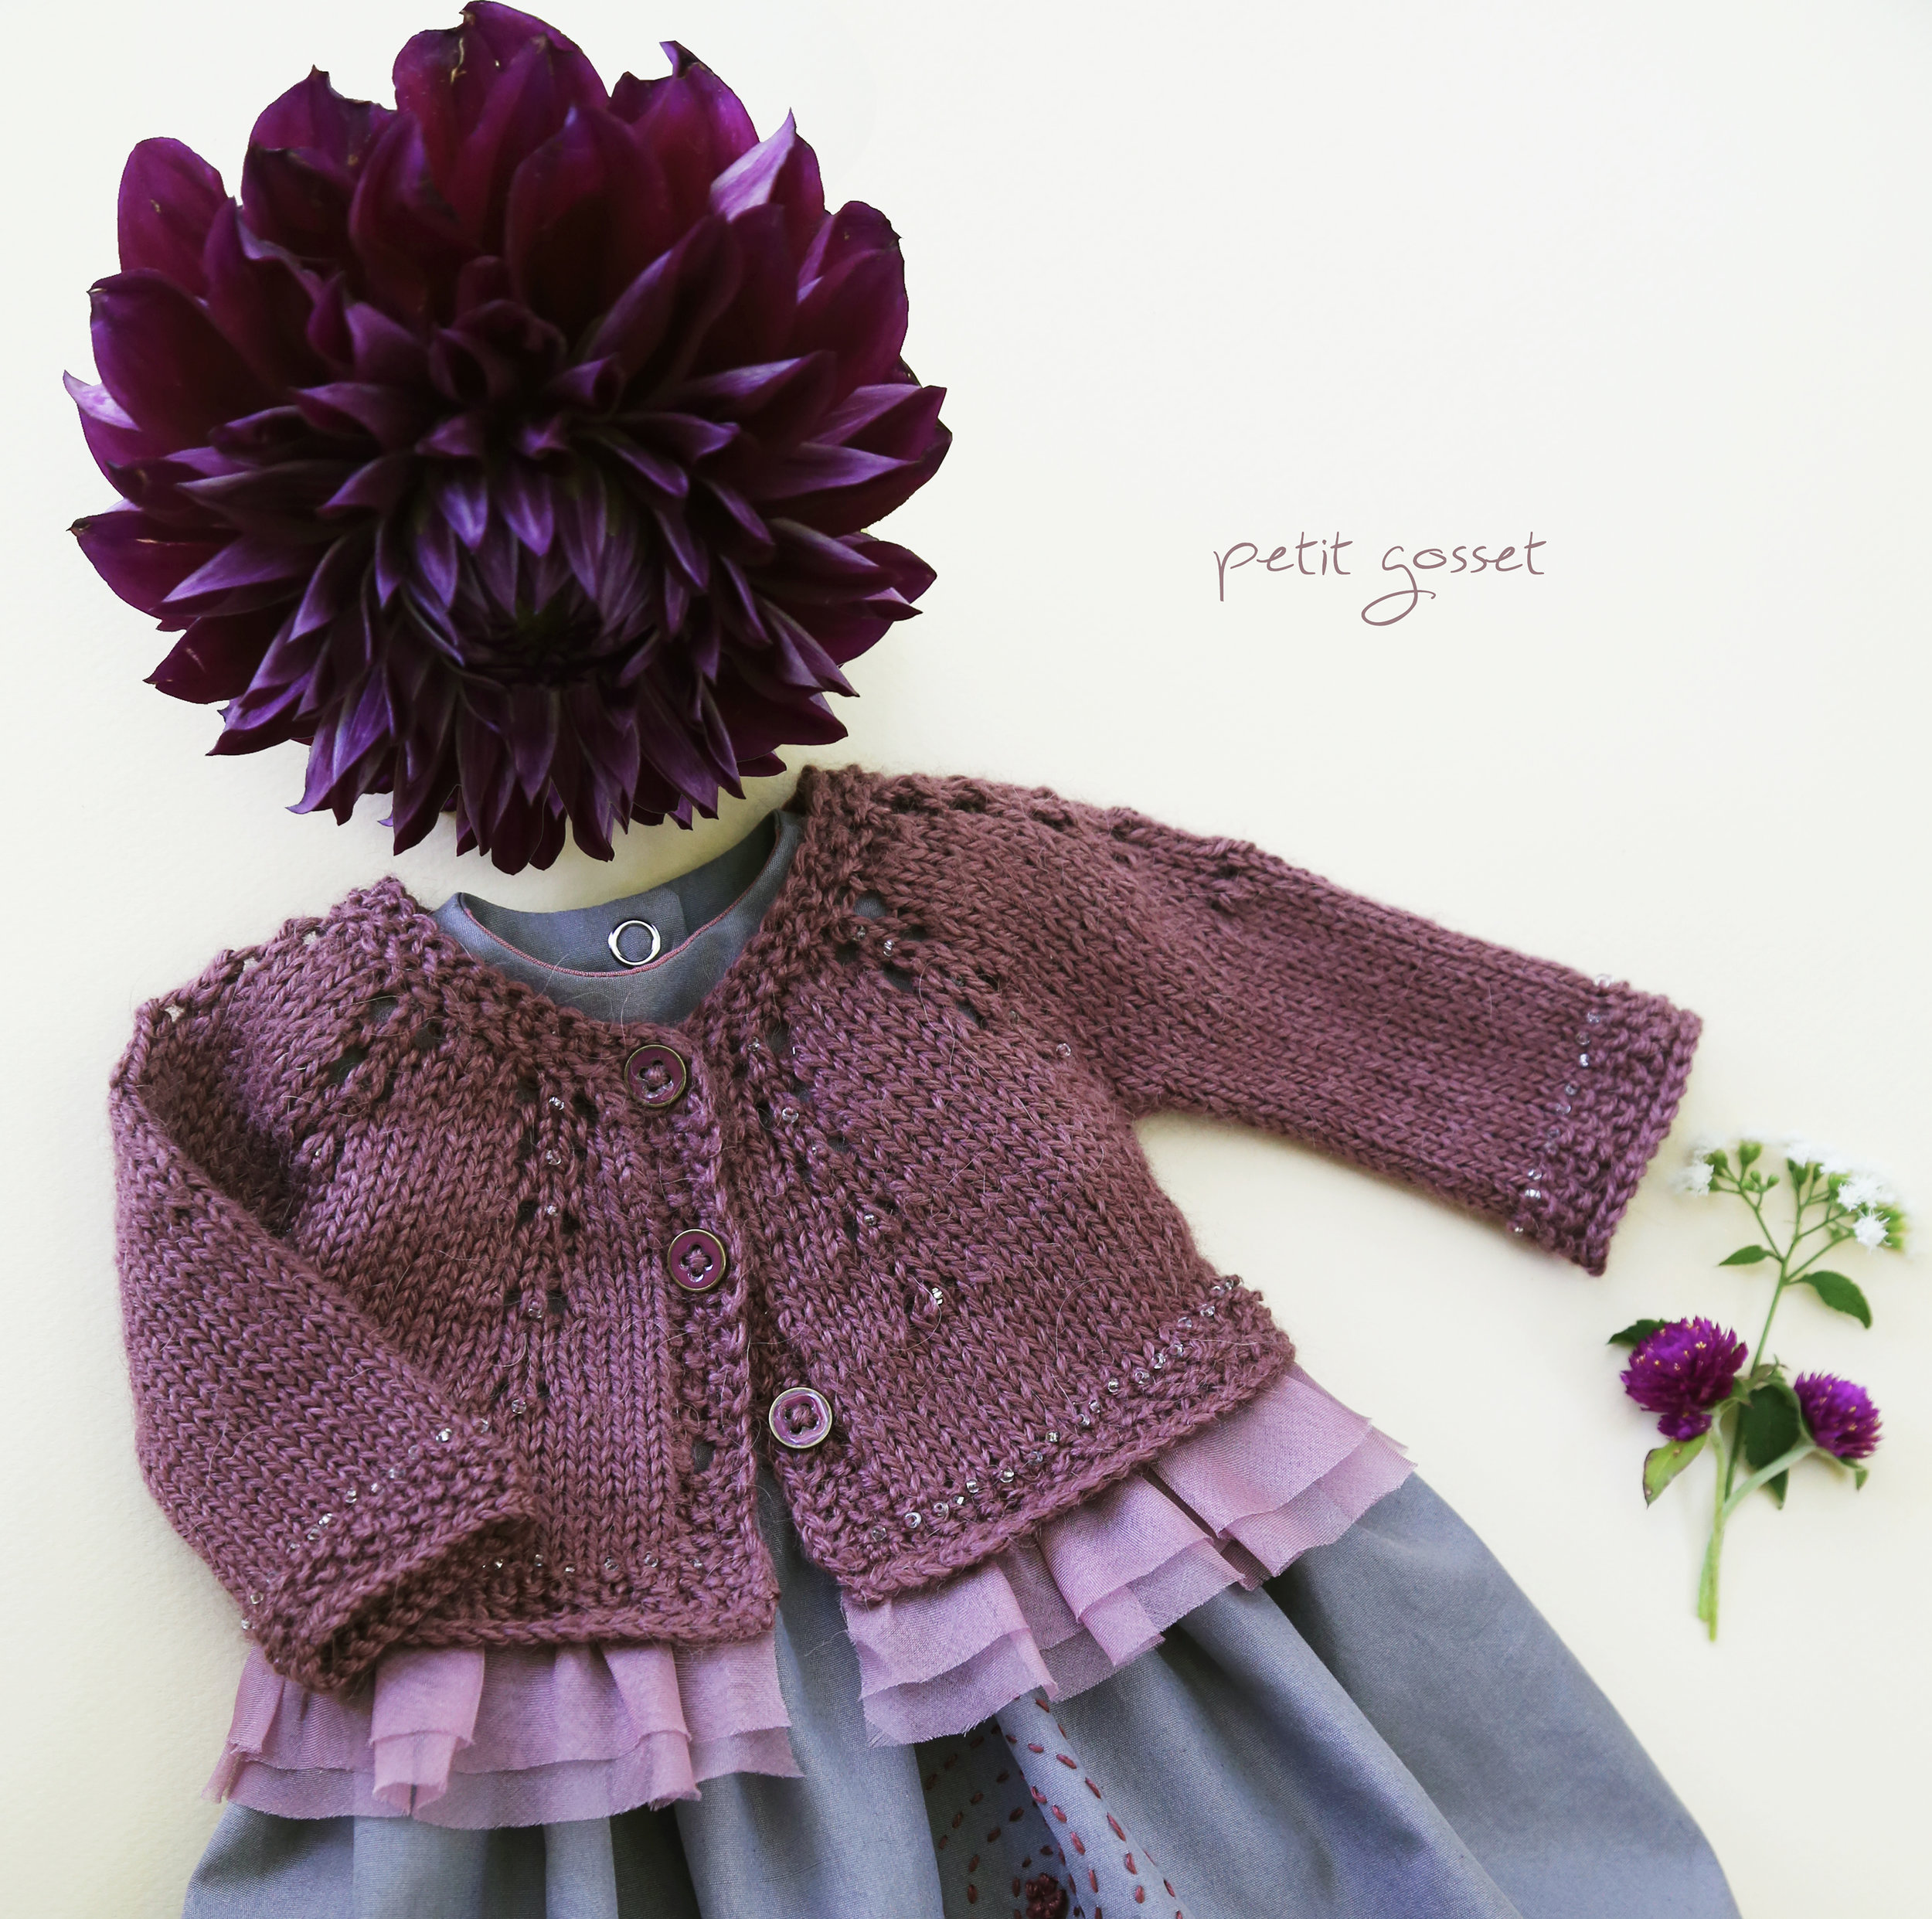 dress with a flower.jpg